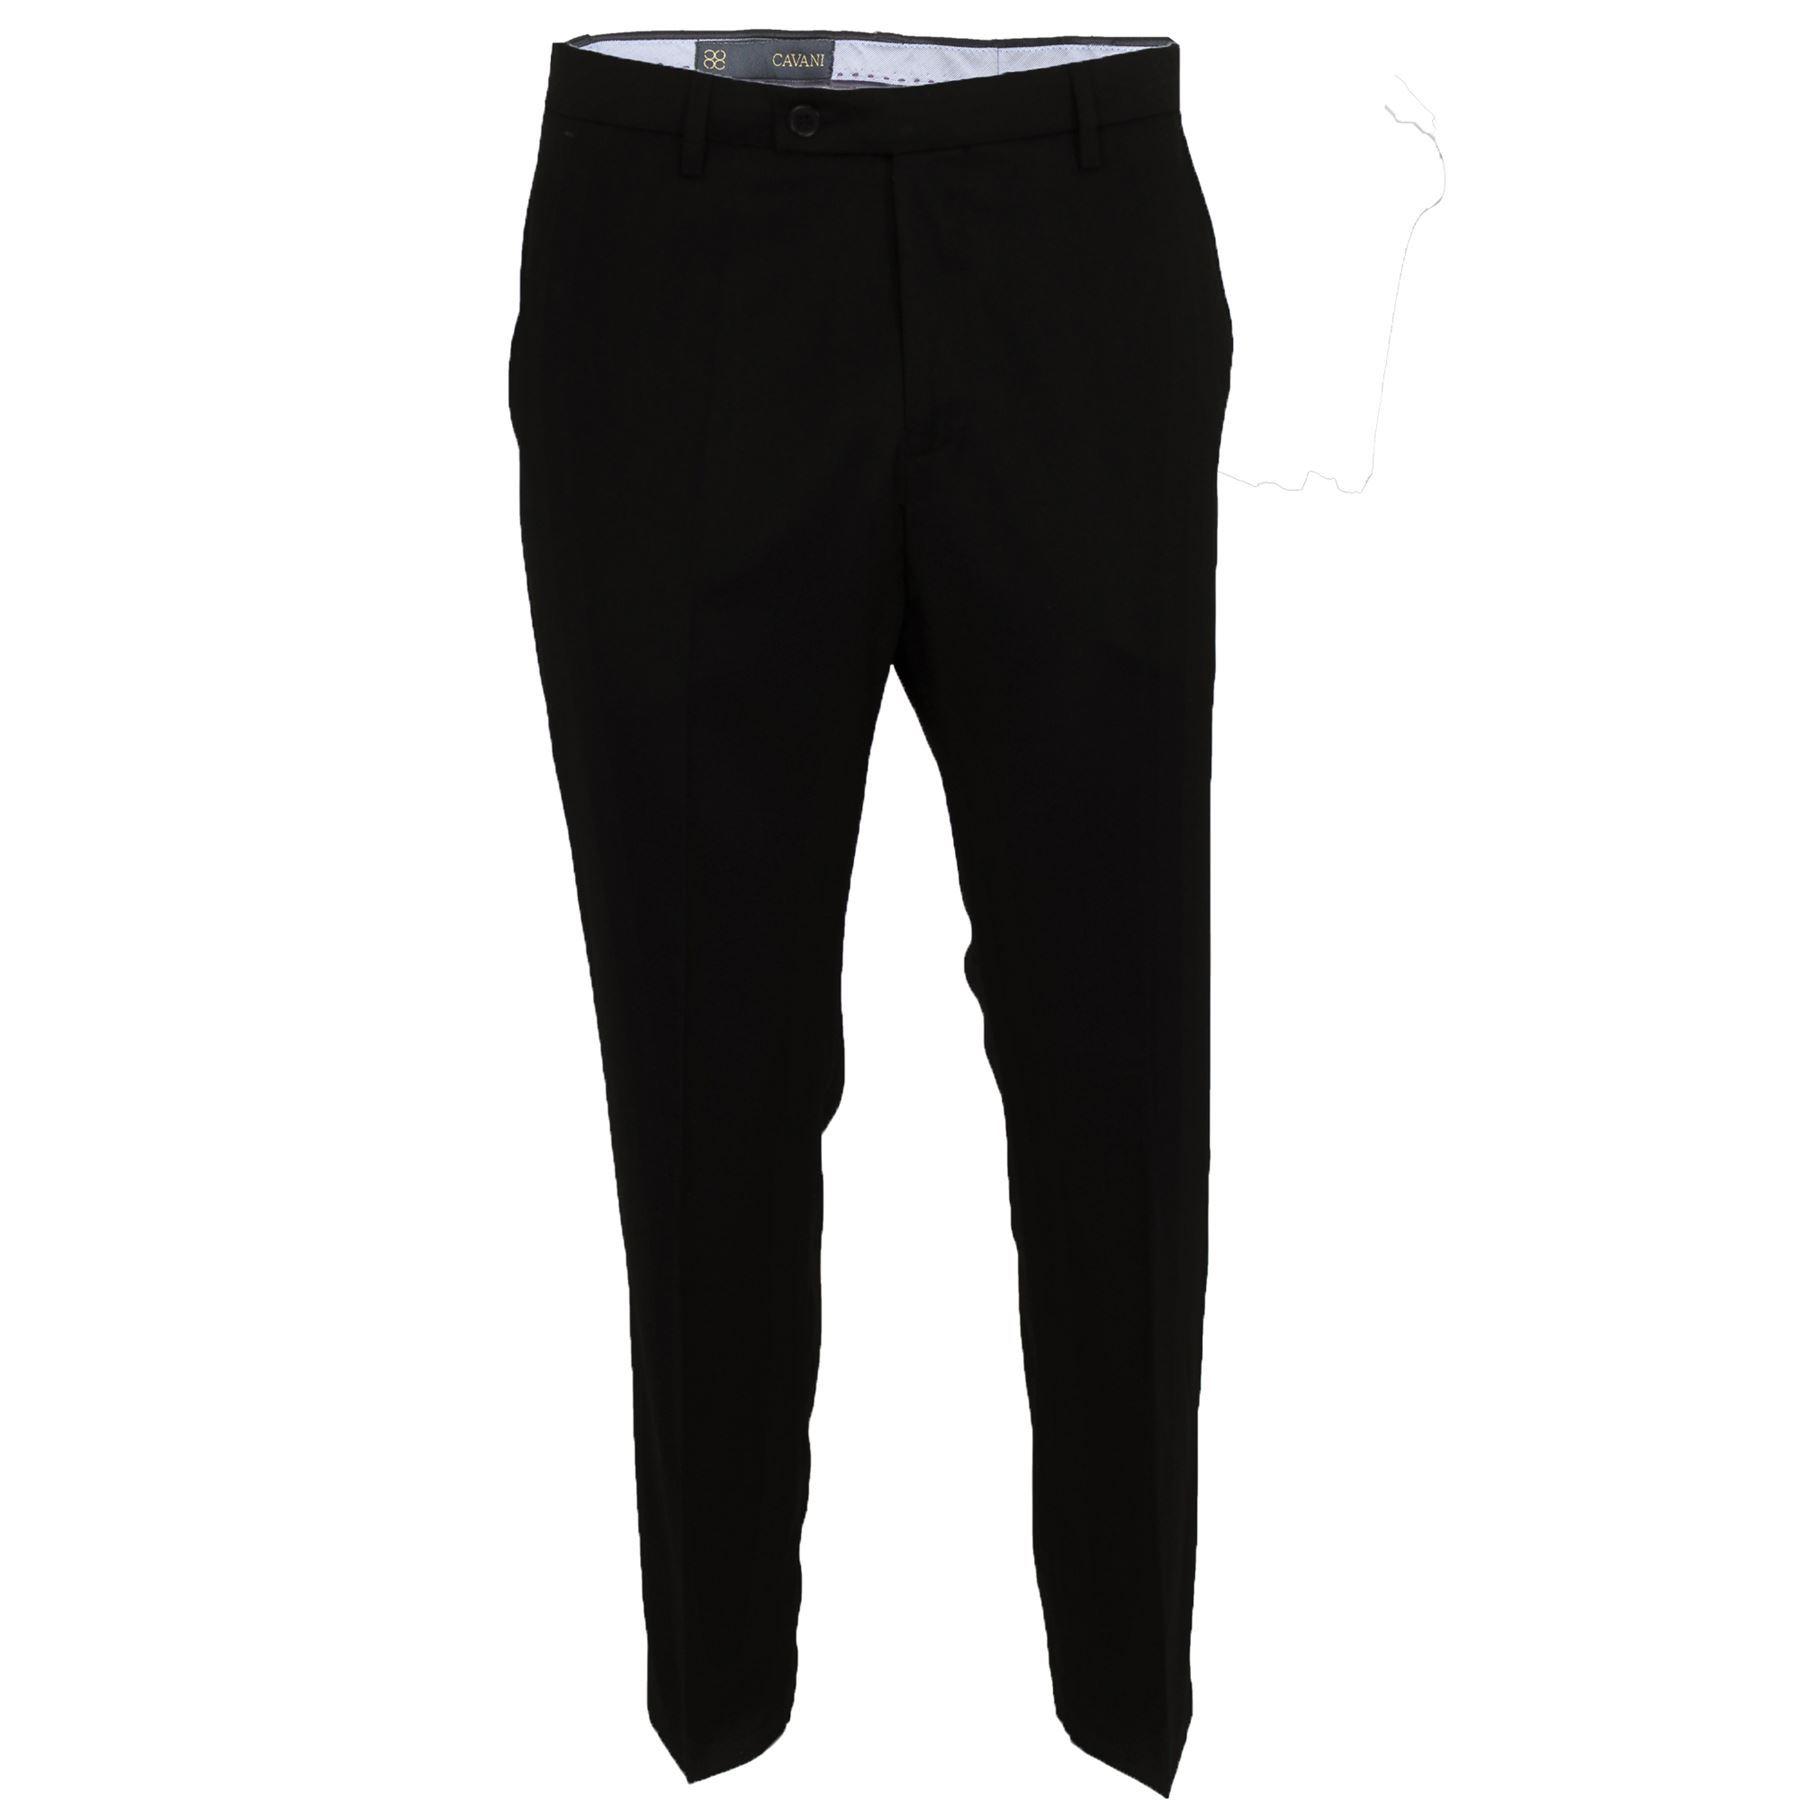 exceptional range of styles cost charm the cheapest Details about Mens Cavani Smart Formal Casual Plain Black Pants Slim Fit  Suit Trousers